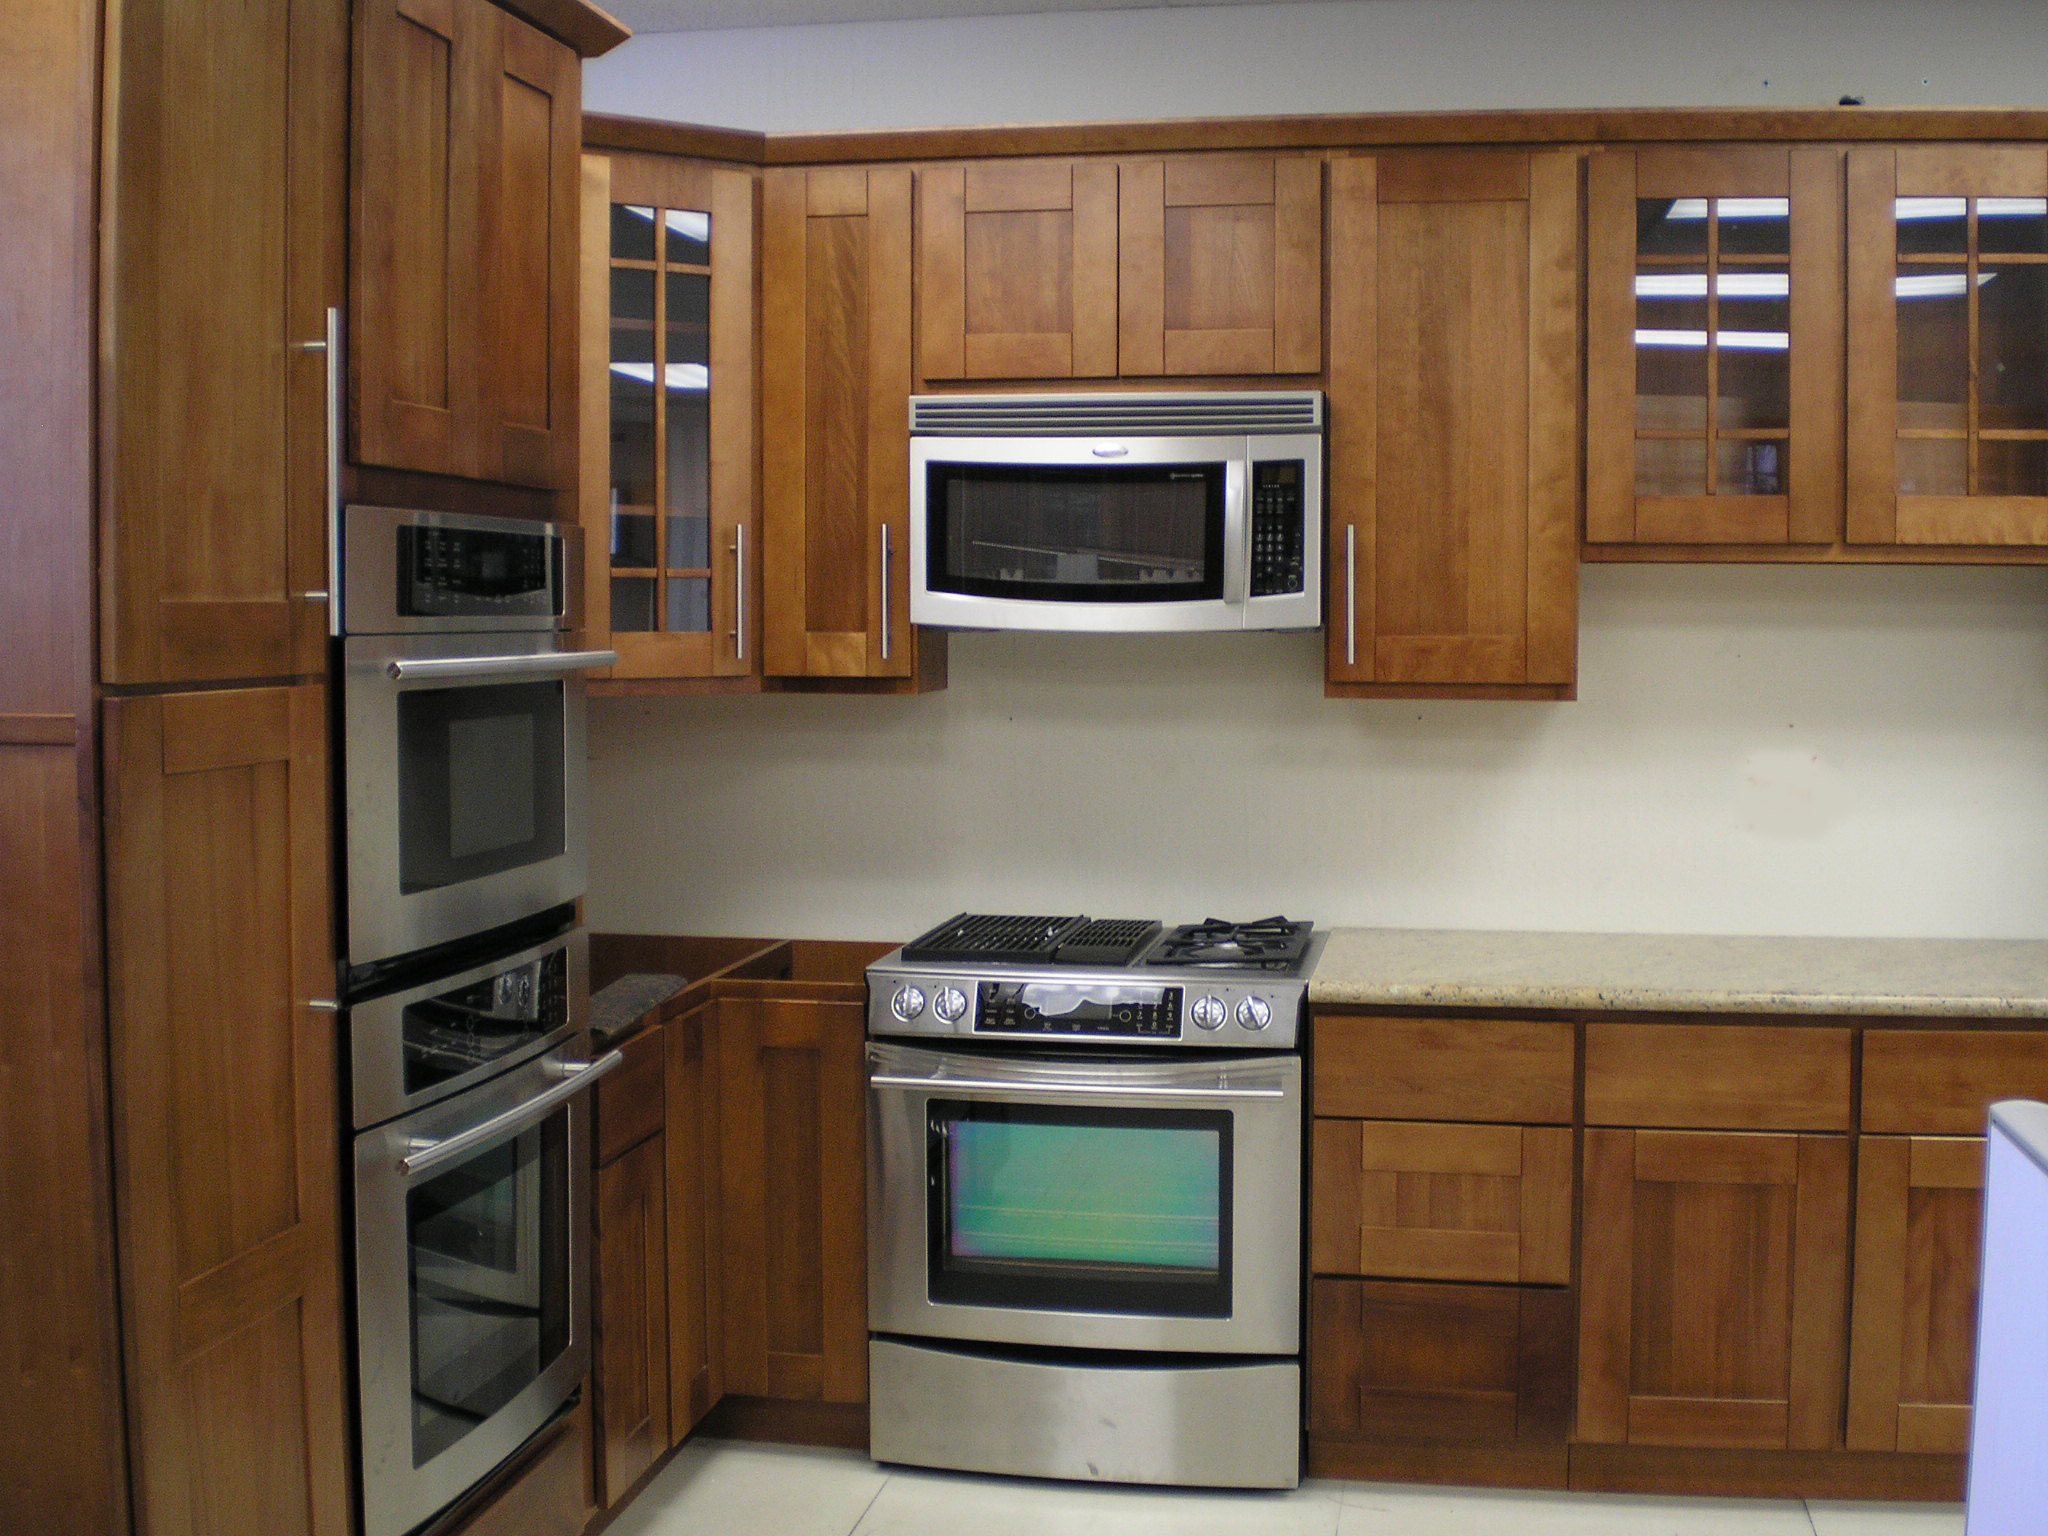 Kitchen wall cabinets Photo - 5